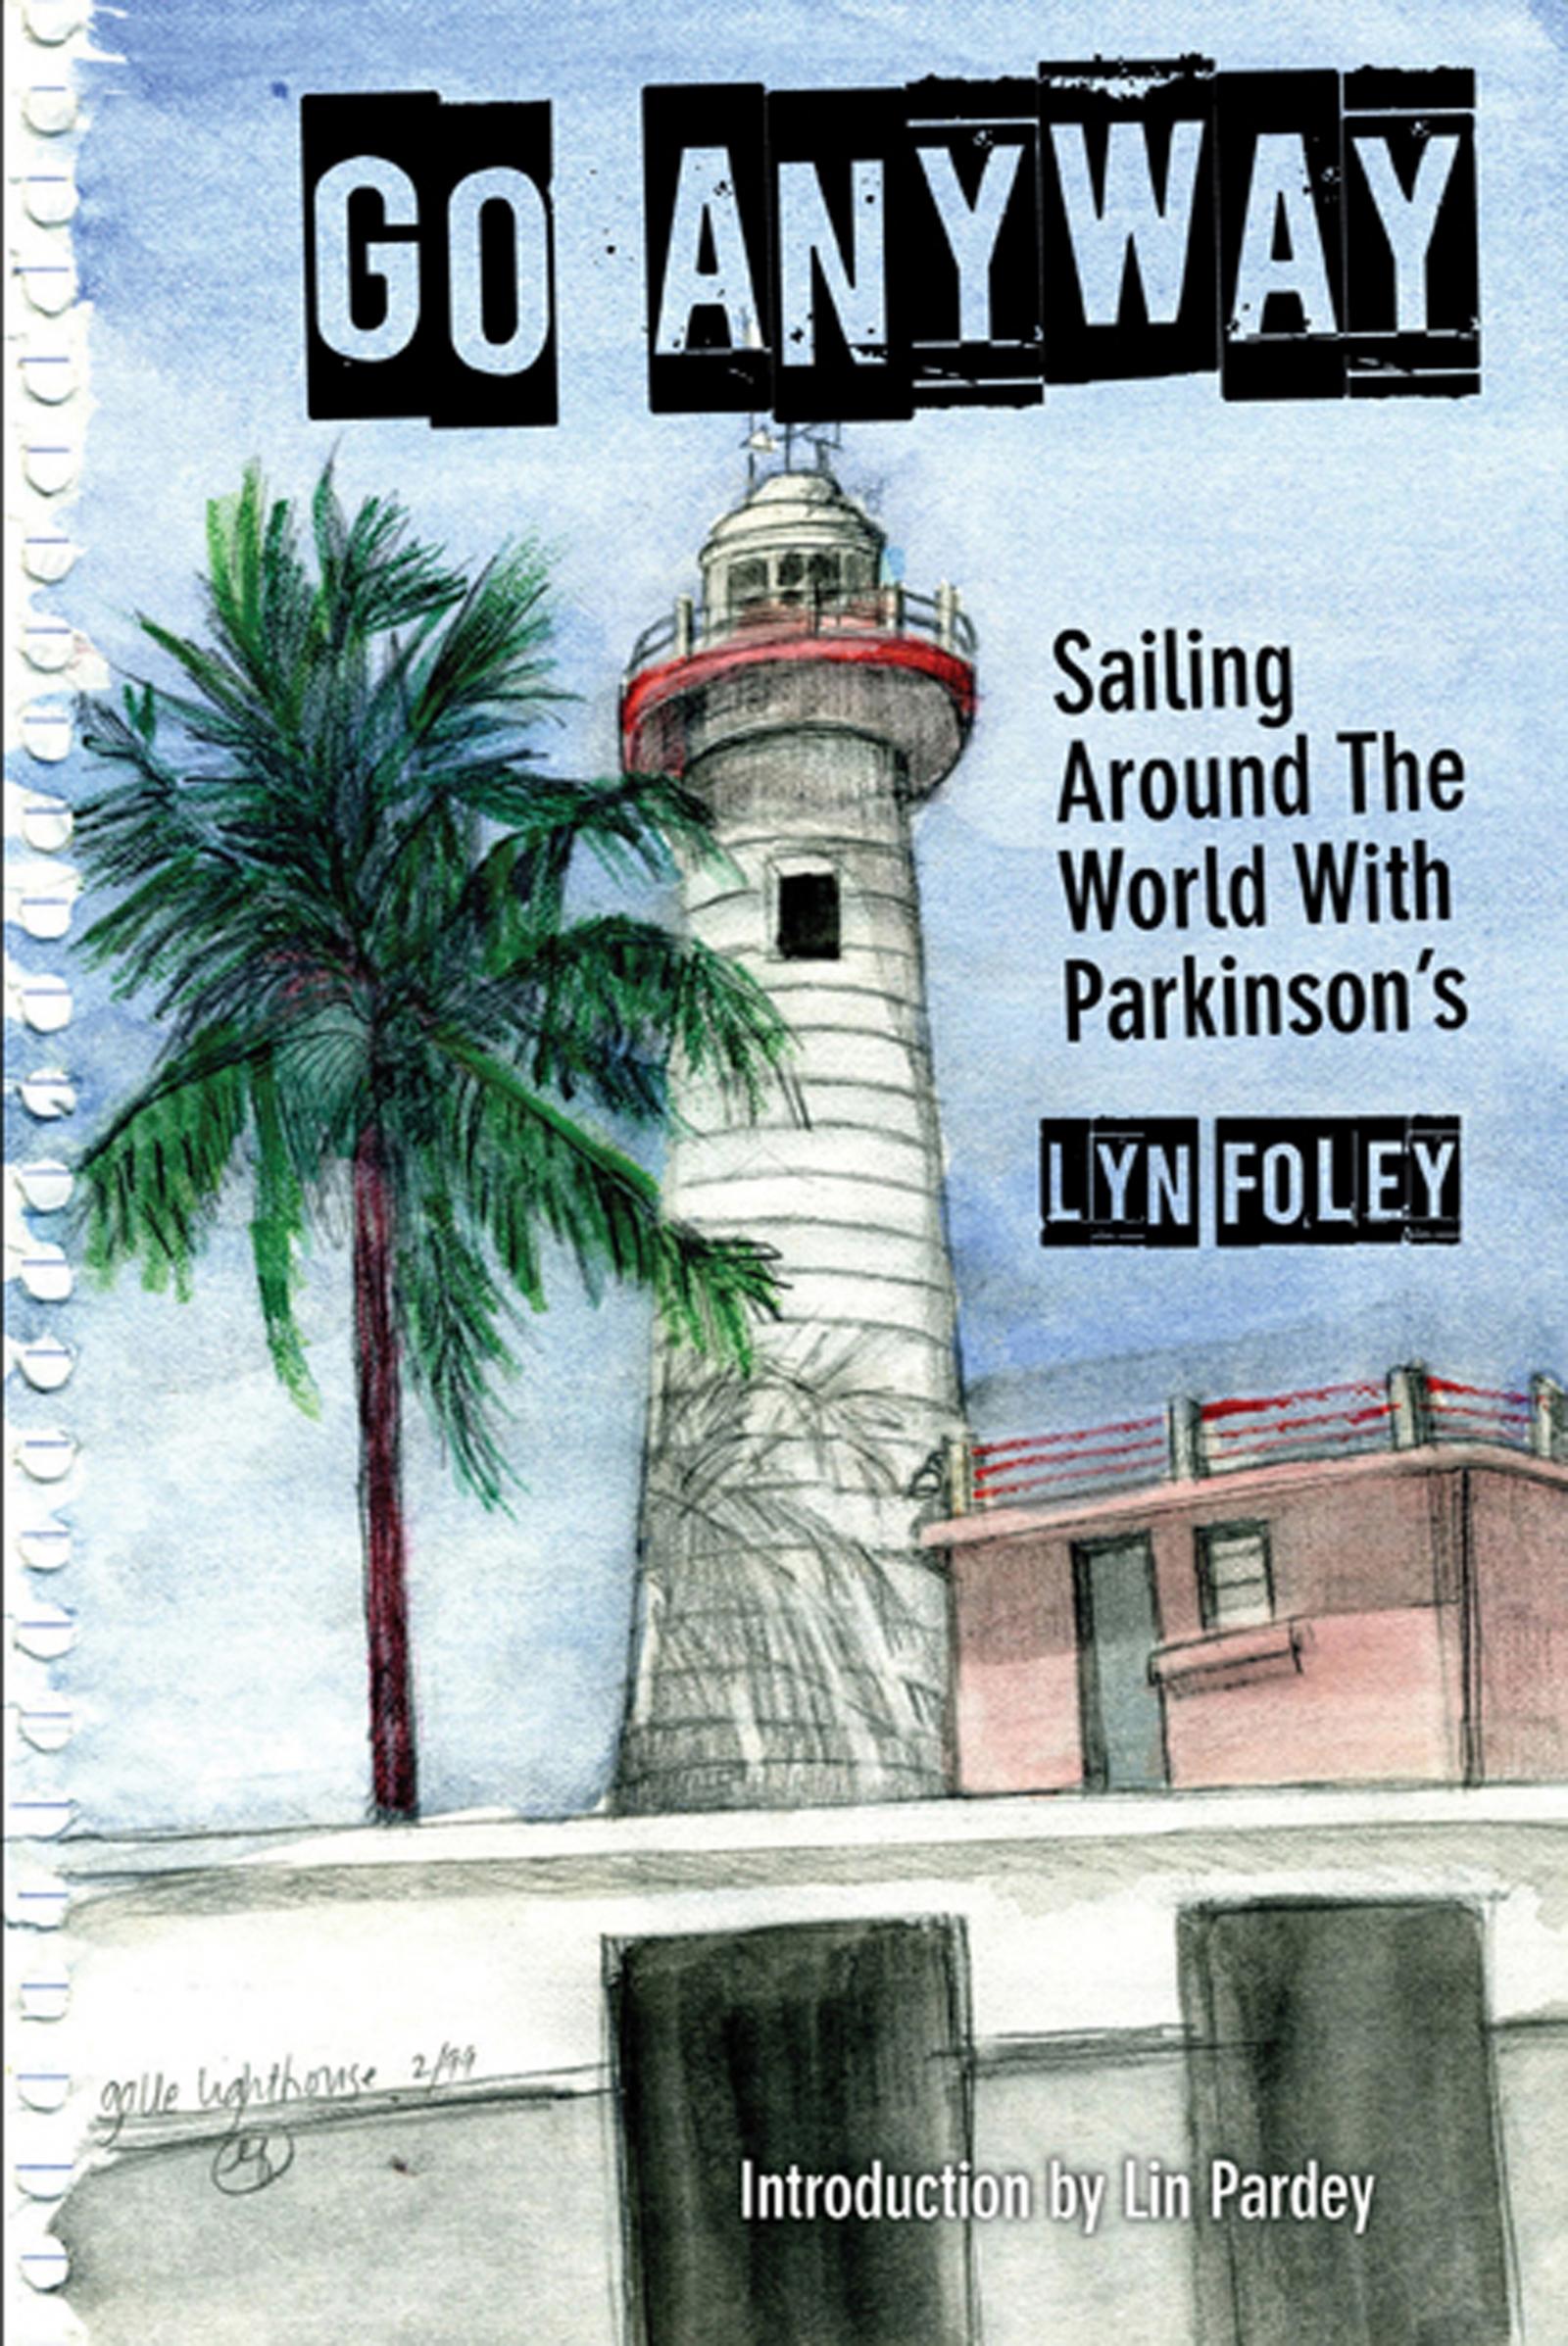 Go Anyway Book Cover - Lyn Foley.jpg